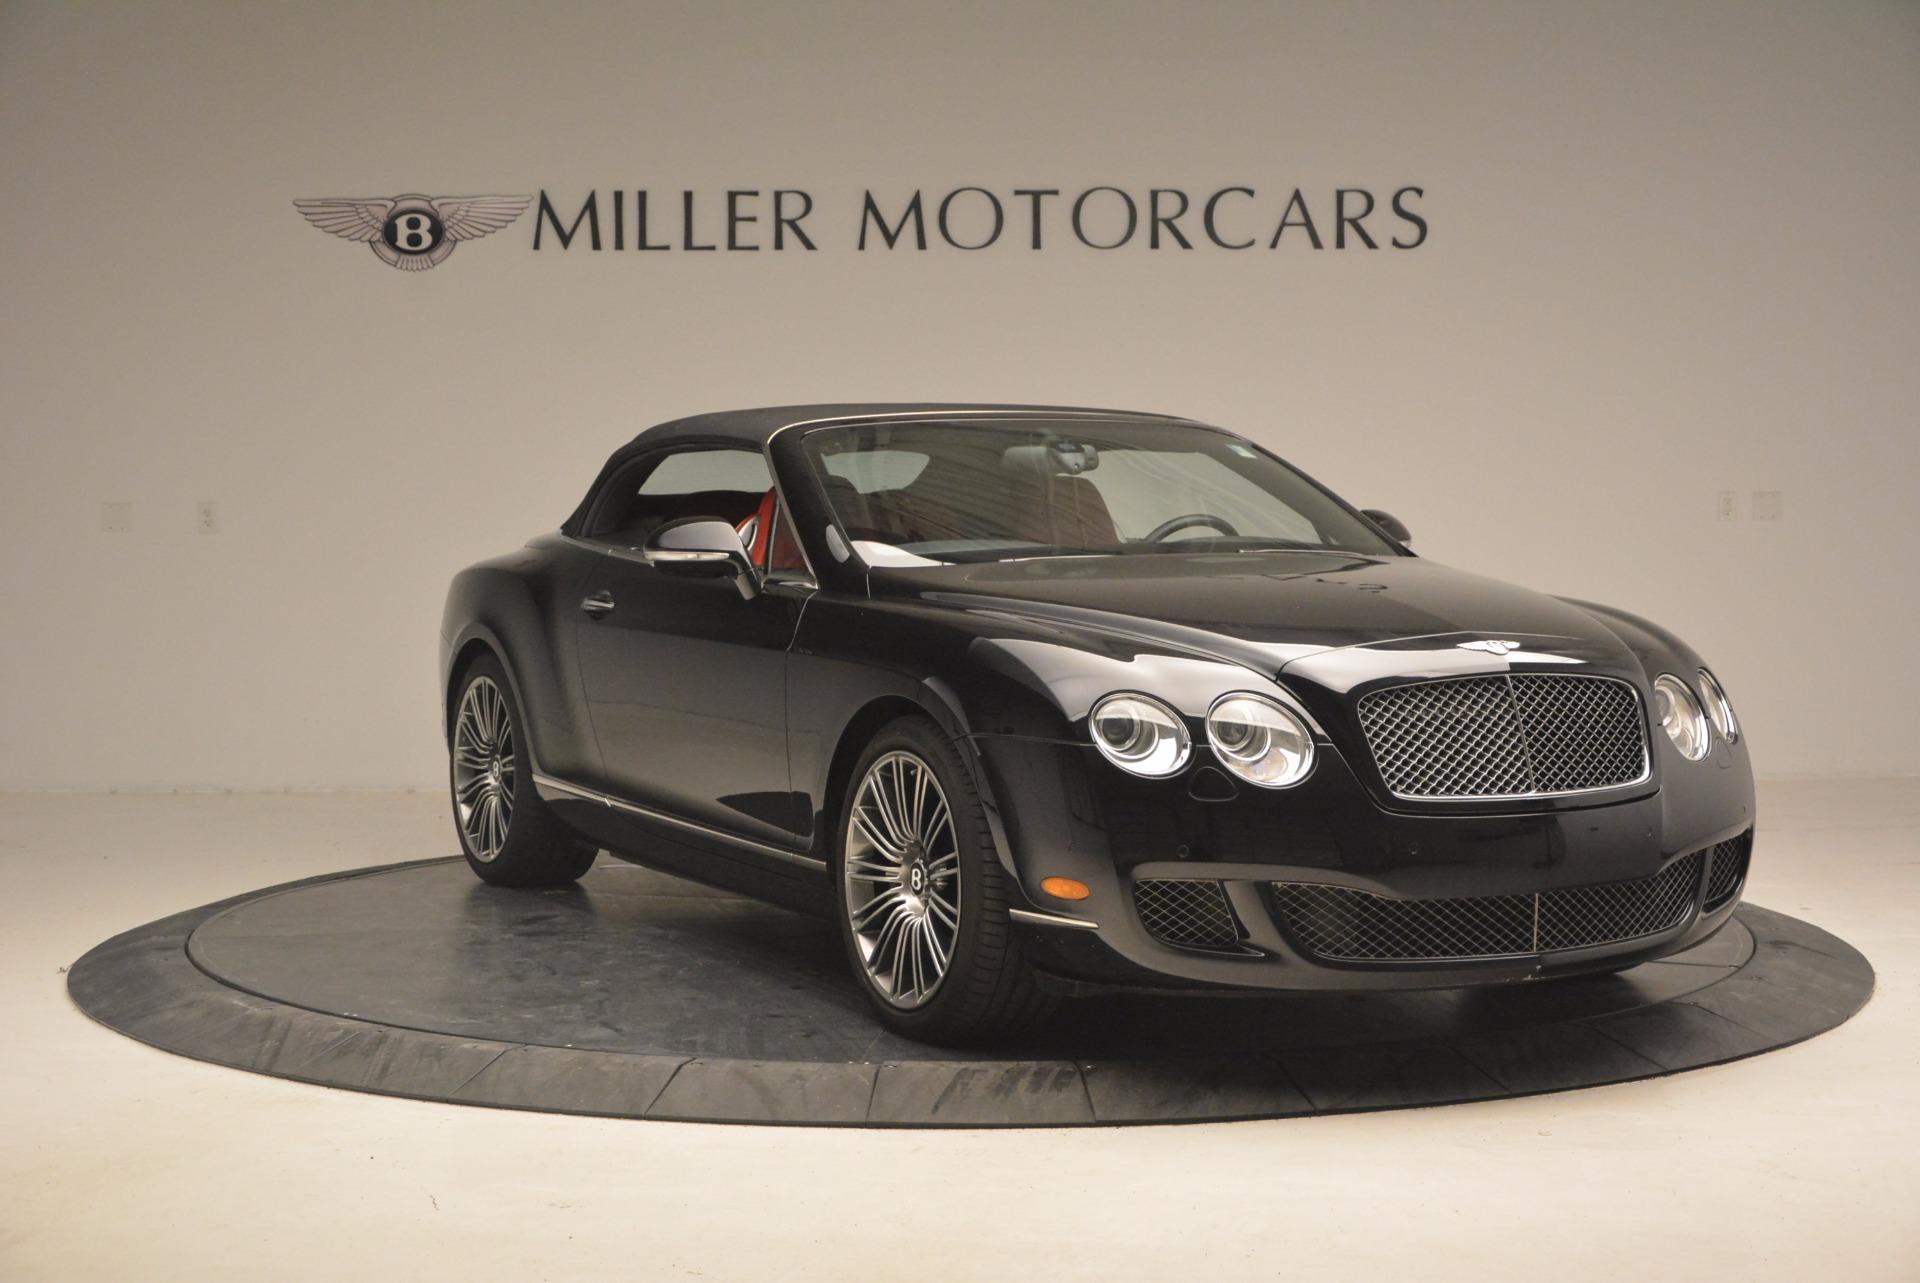 Used 2010 Bentley Continental GT Speed For Sale In Westport, CT 1298_p24